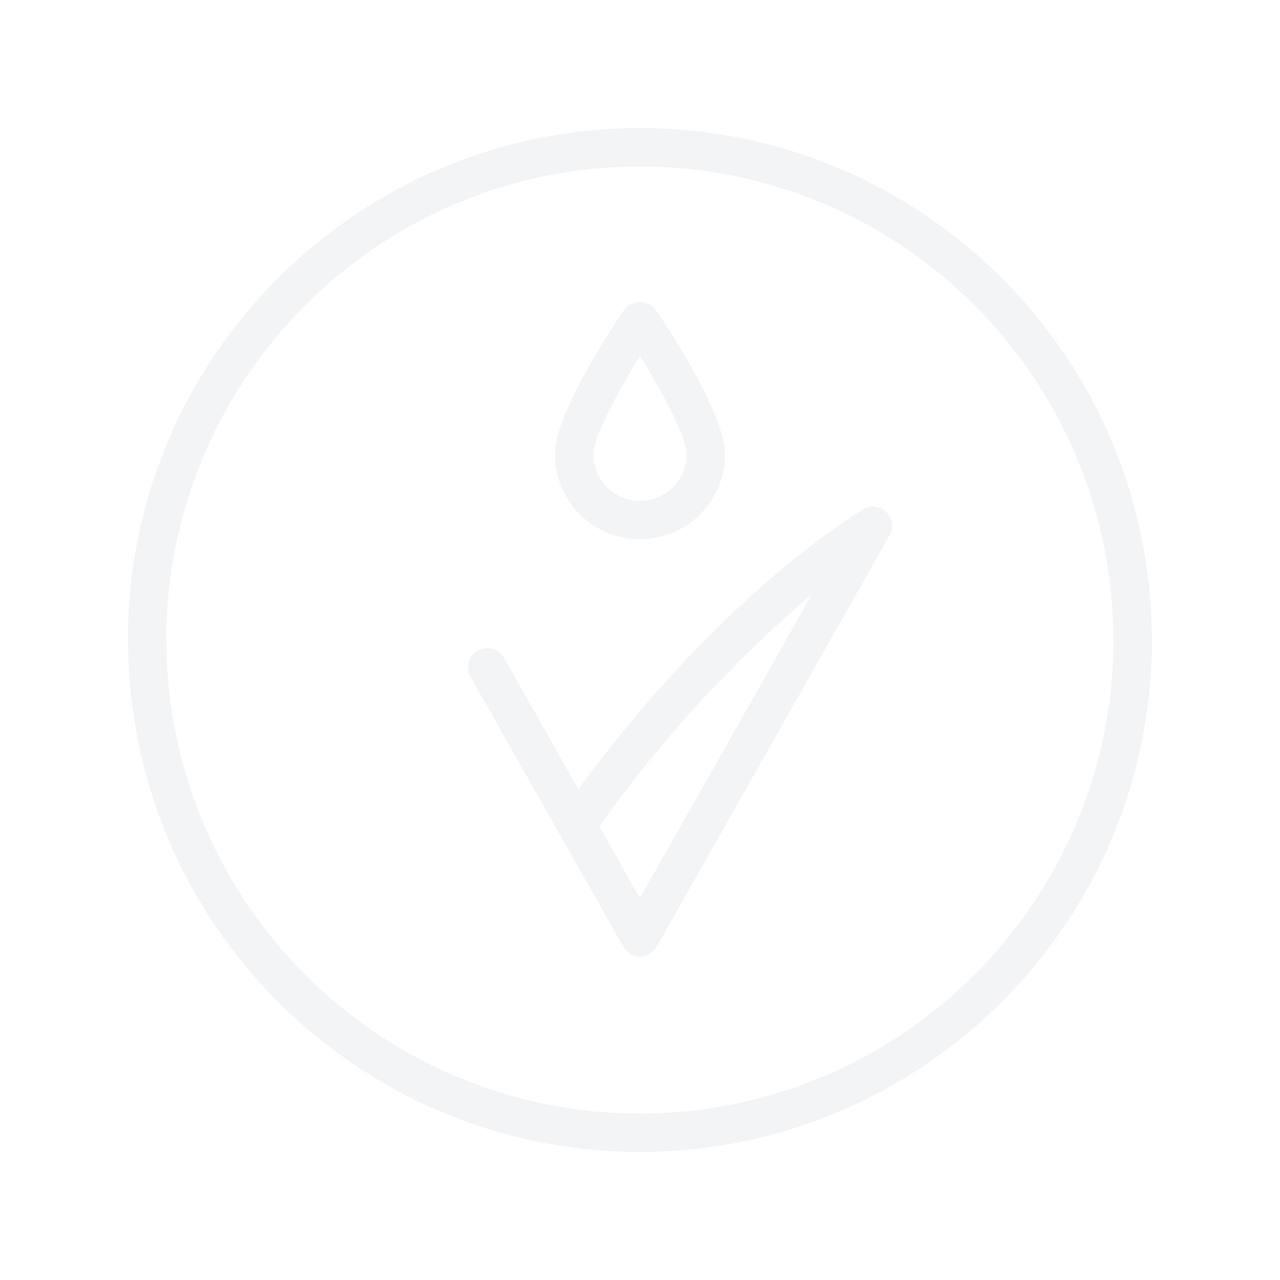 MISSHA Real Moist24 Manuka Honey Hand Cream 70ml